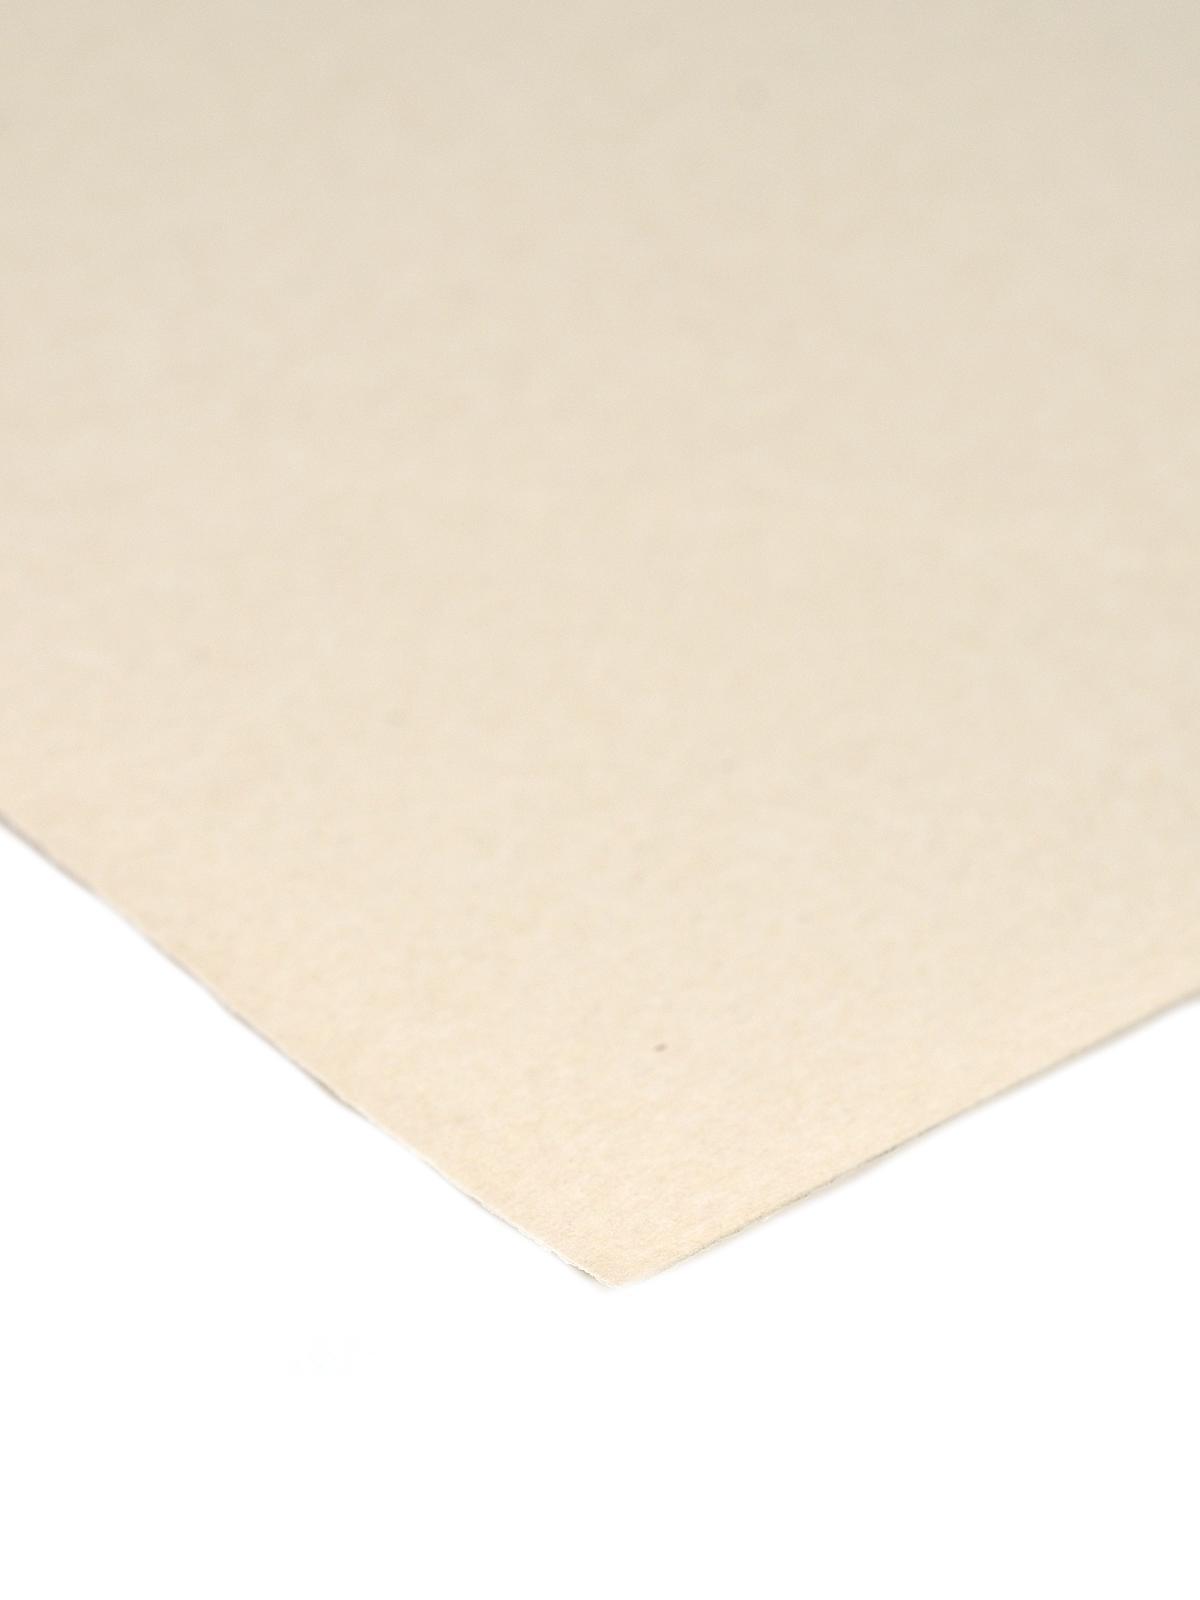 uart premium sanded pastel paper misterart com